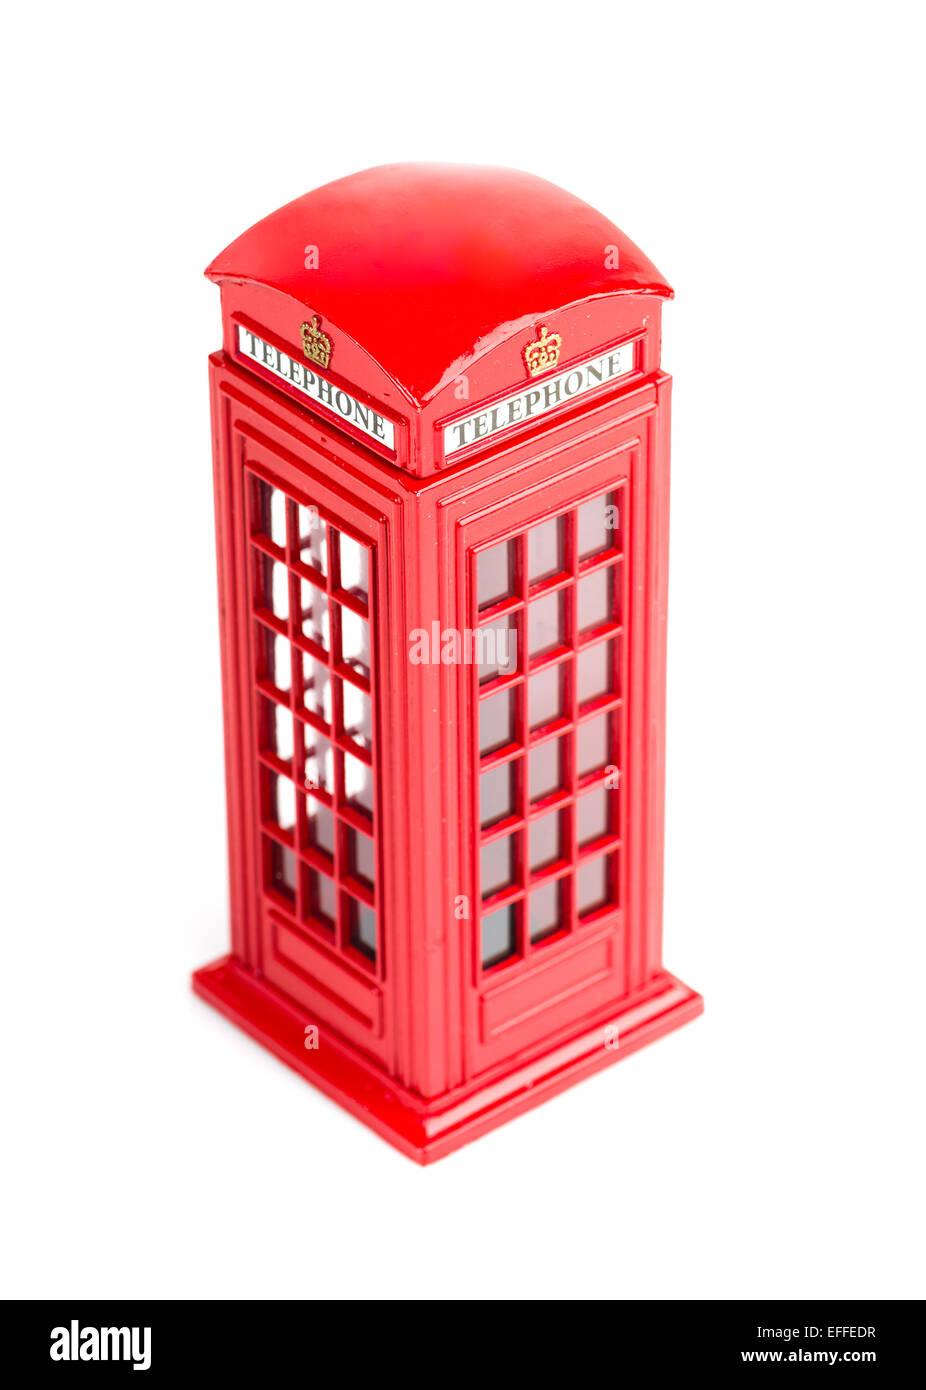 London red telephone box (souvenir) on white background - Stock Image